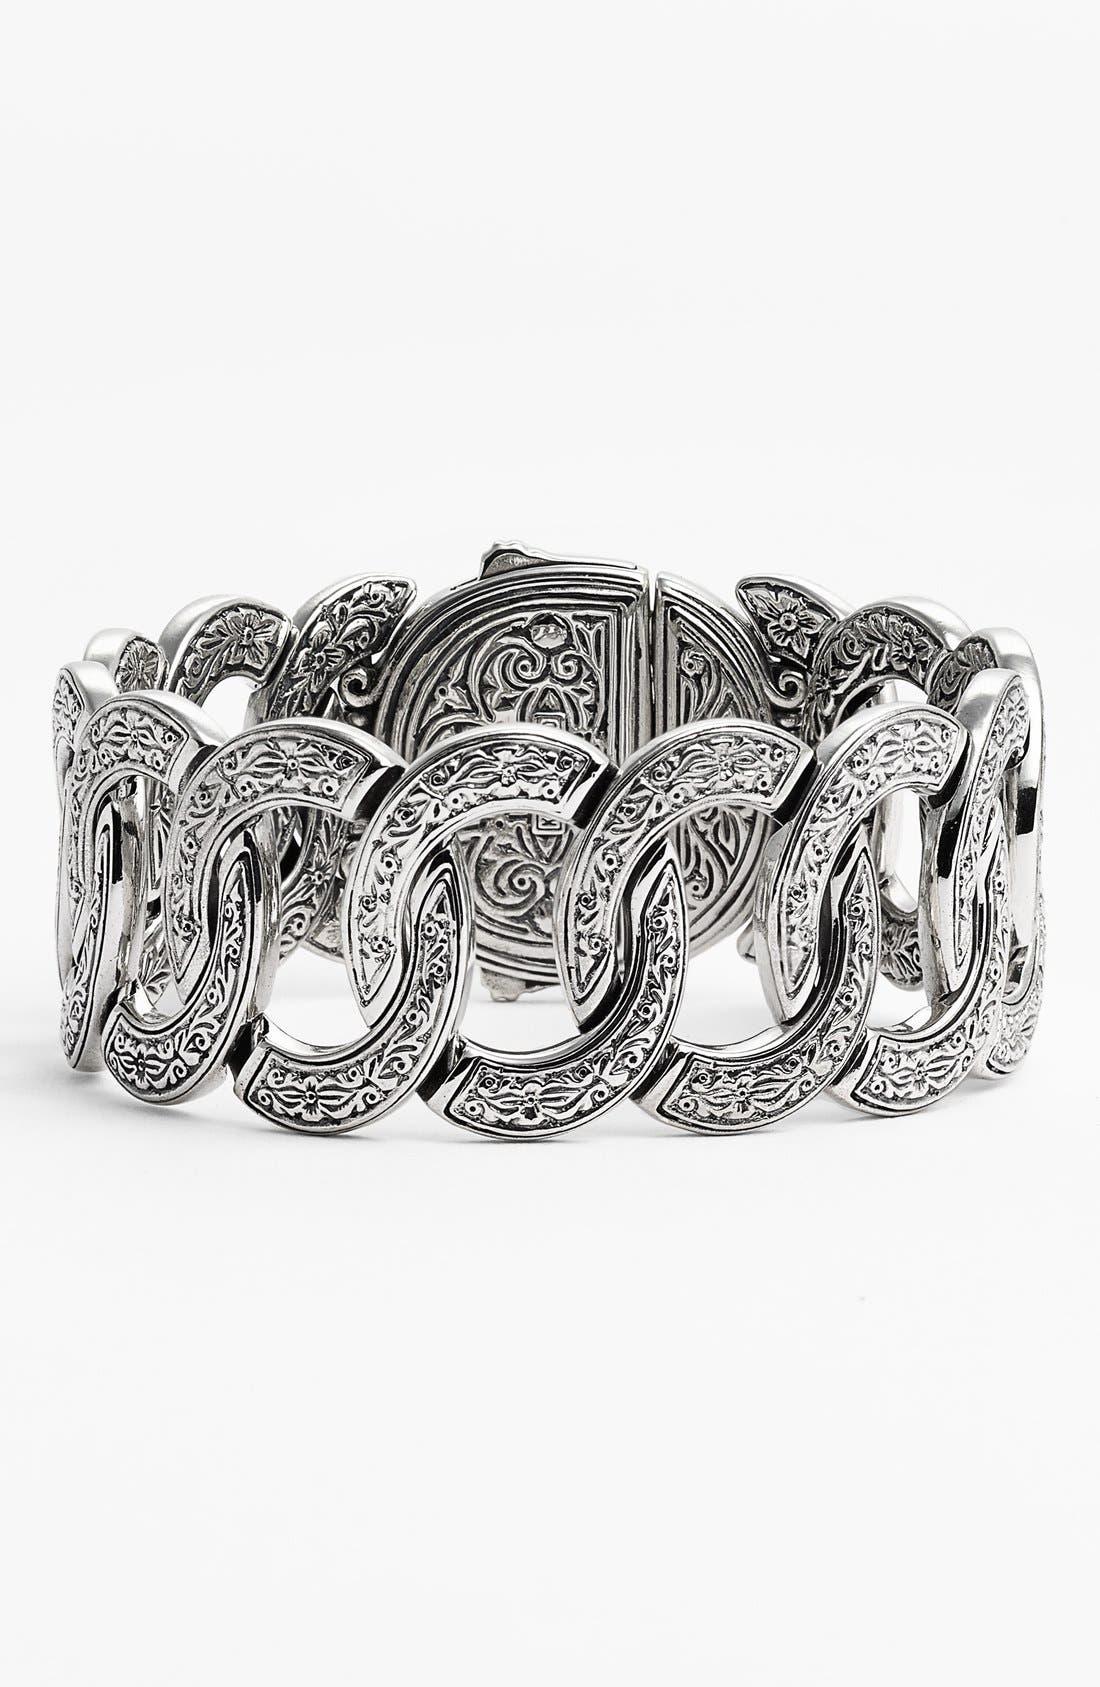 Main Image - Konstantino 'Classics' Link Bracelet